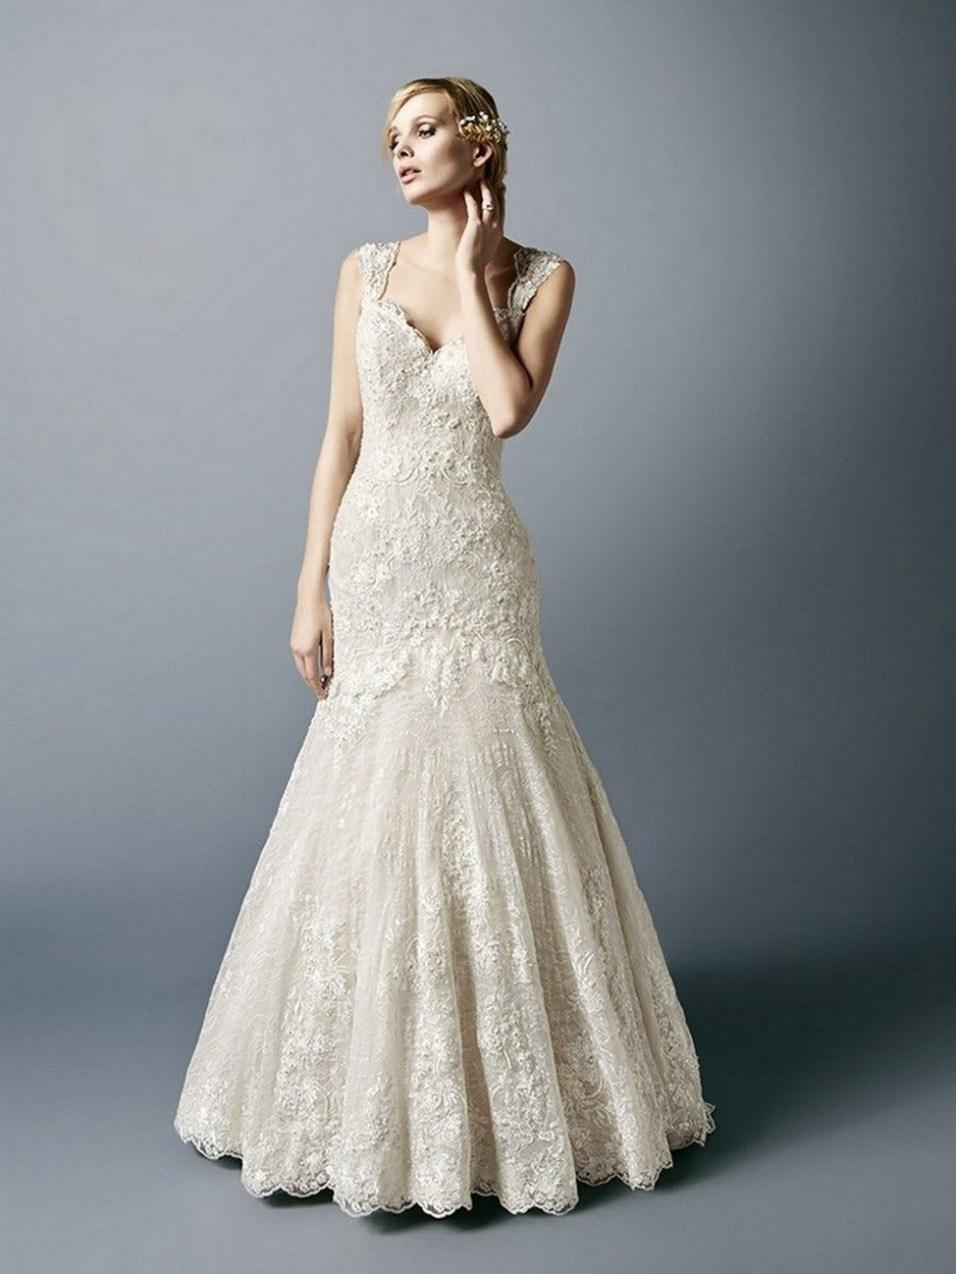 25 Adorable Wedding Dresses for Falll 25